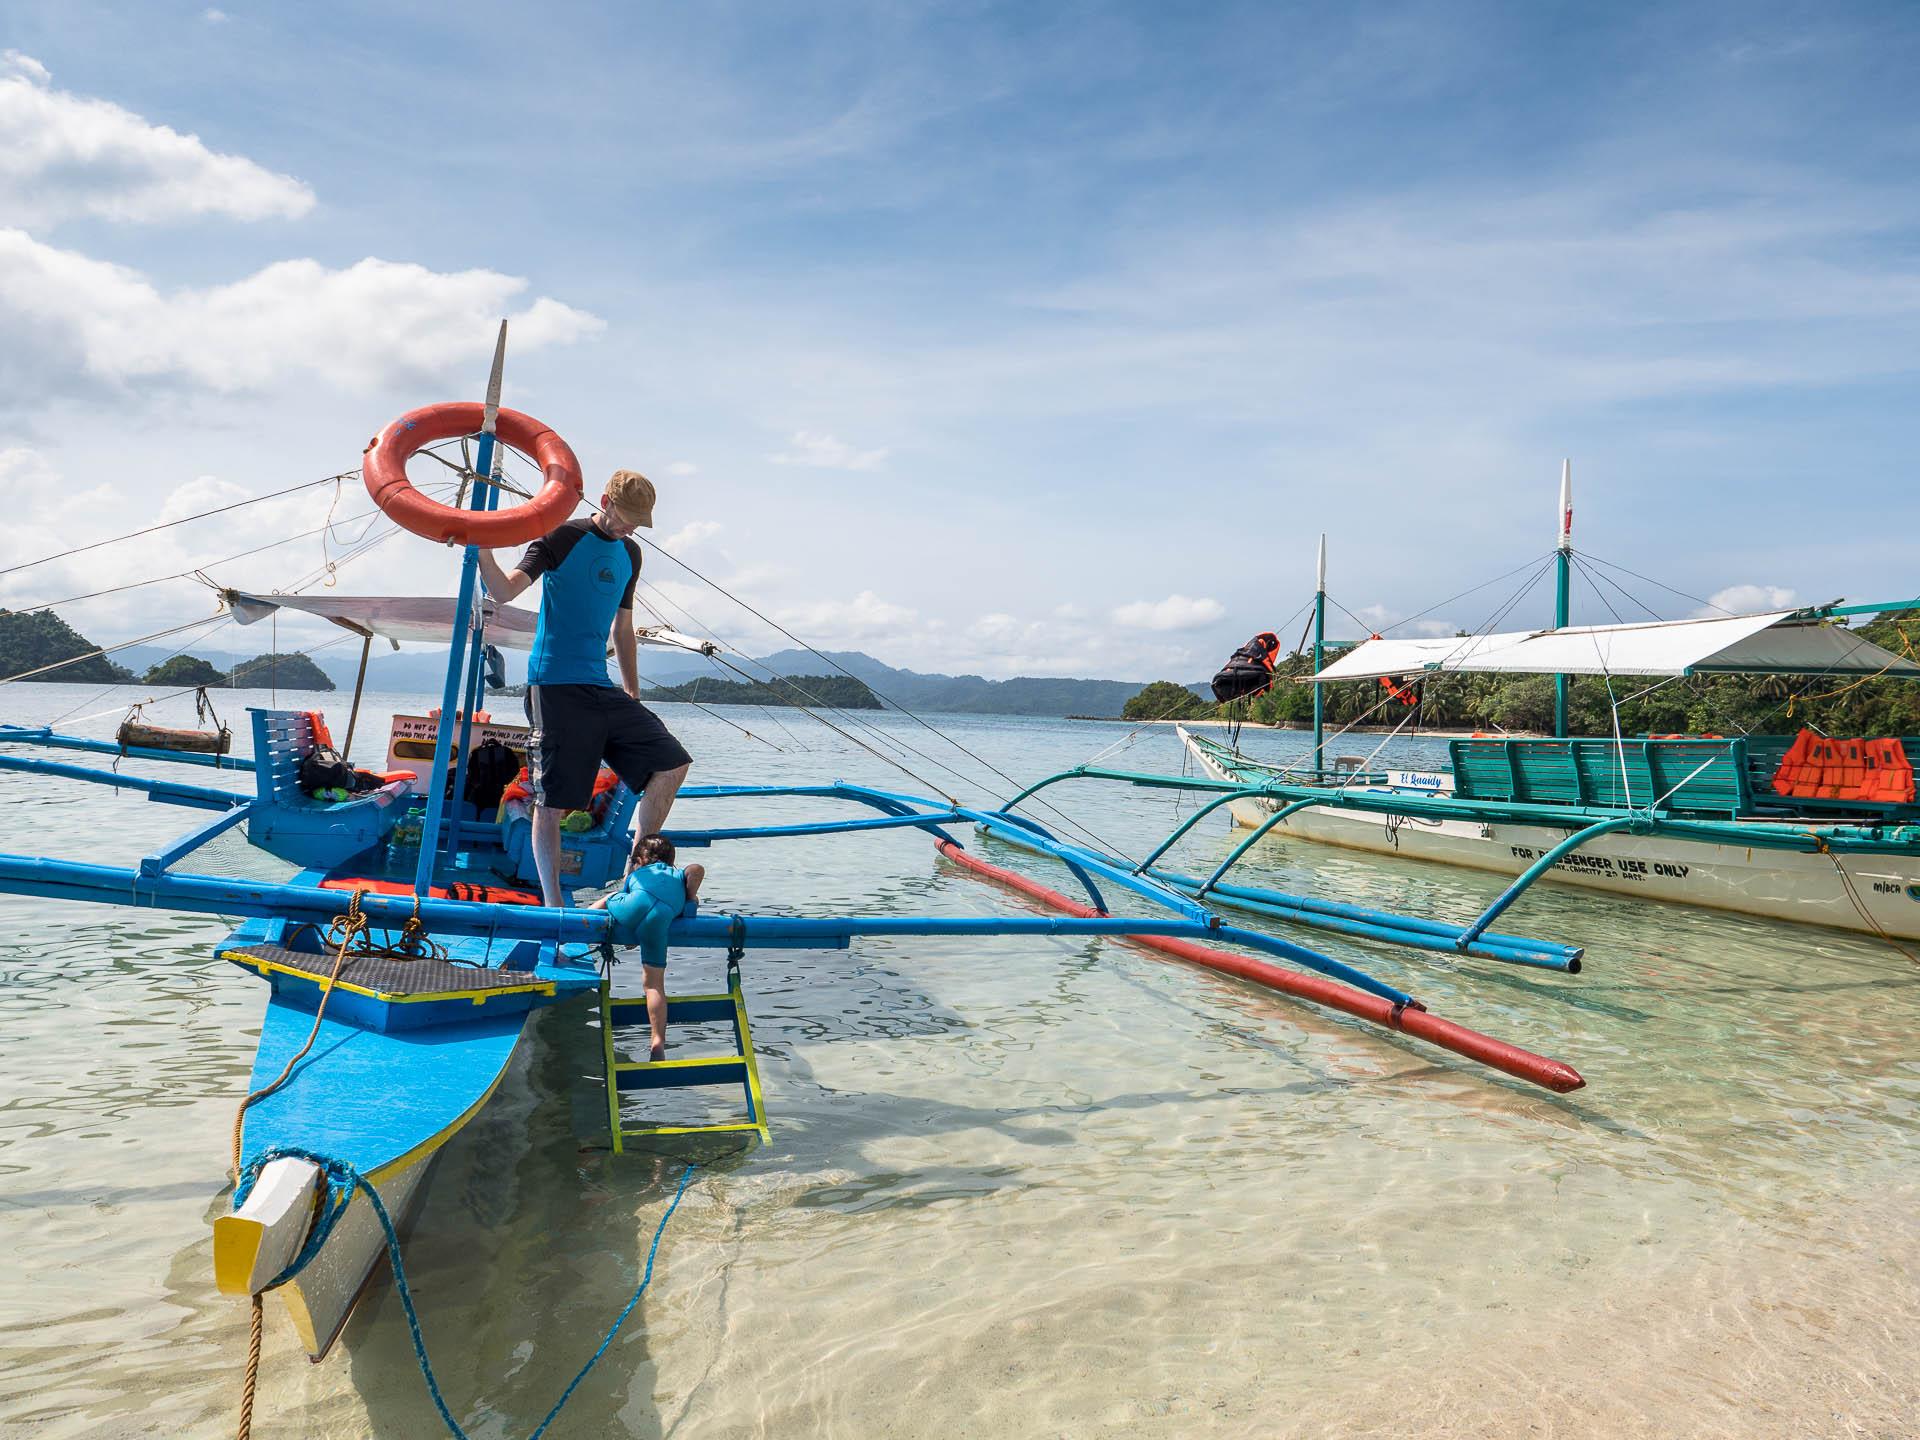 Port barton plage bangka